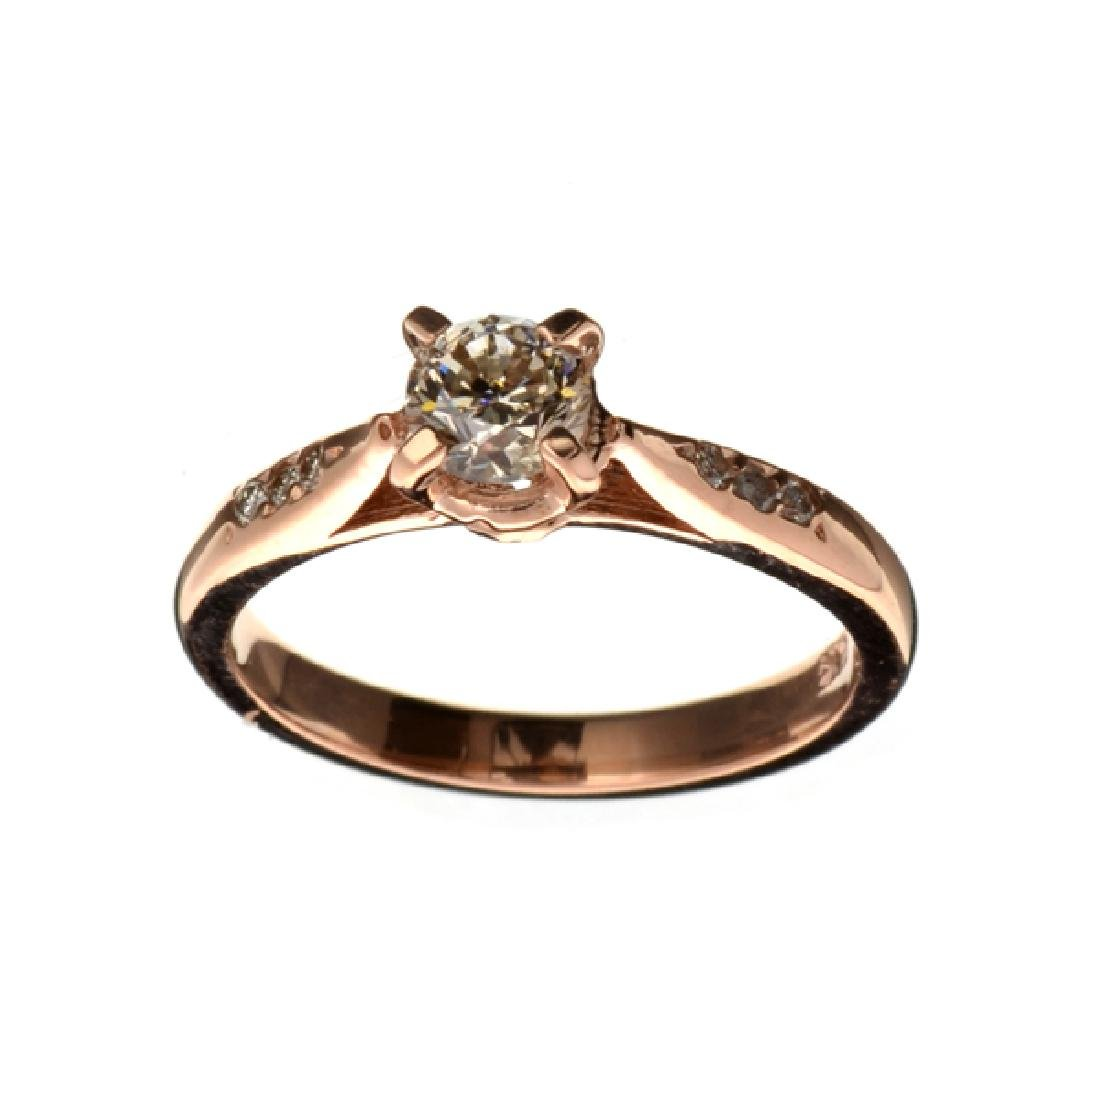 APP: 5.8k Fine Jewelry 14 kt. Rose Gold, 0.56CT Round